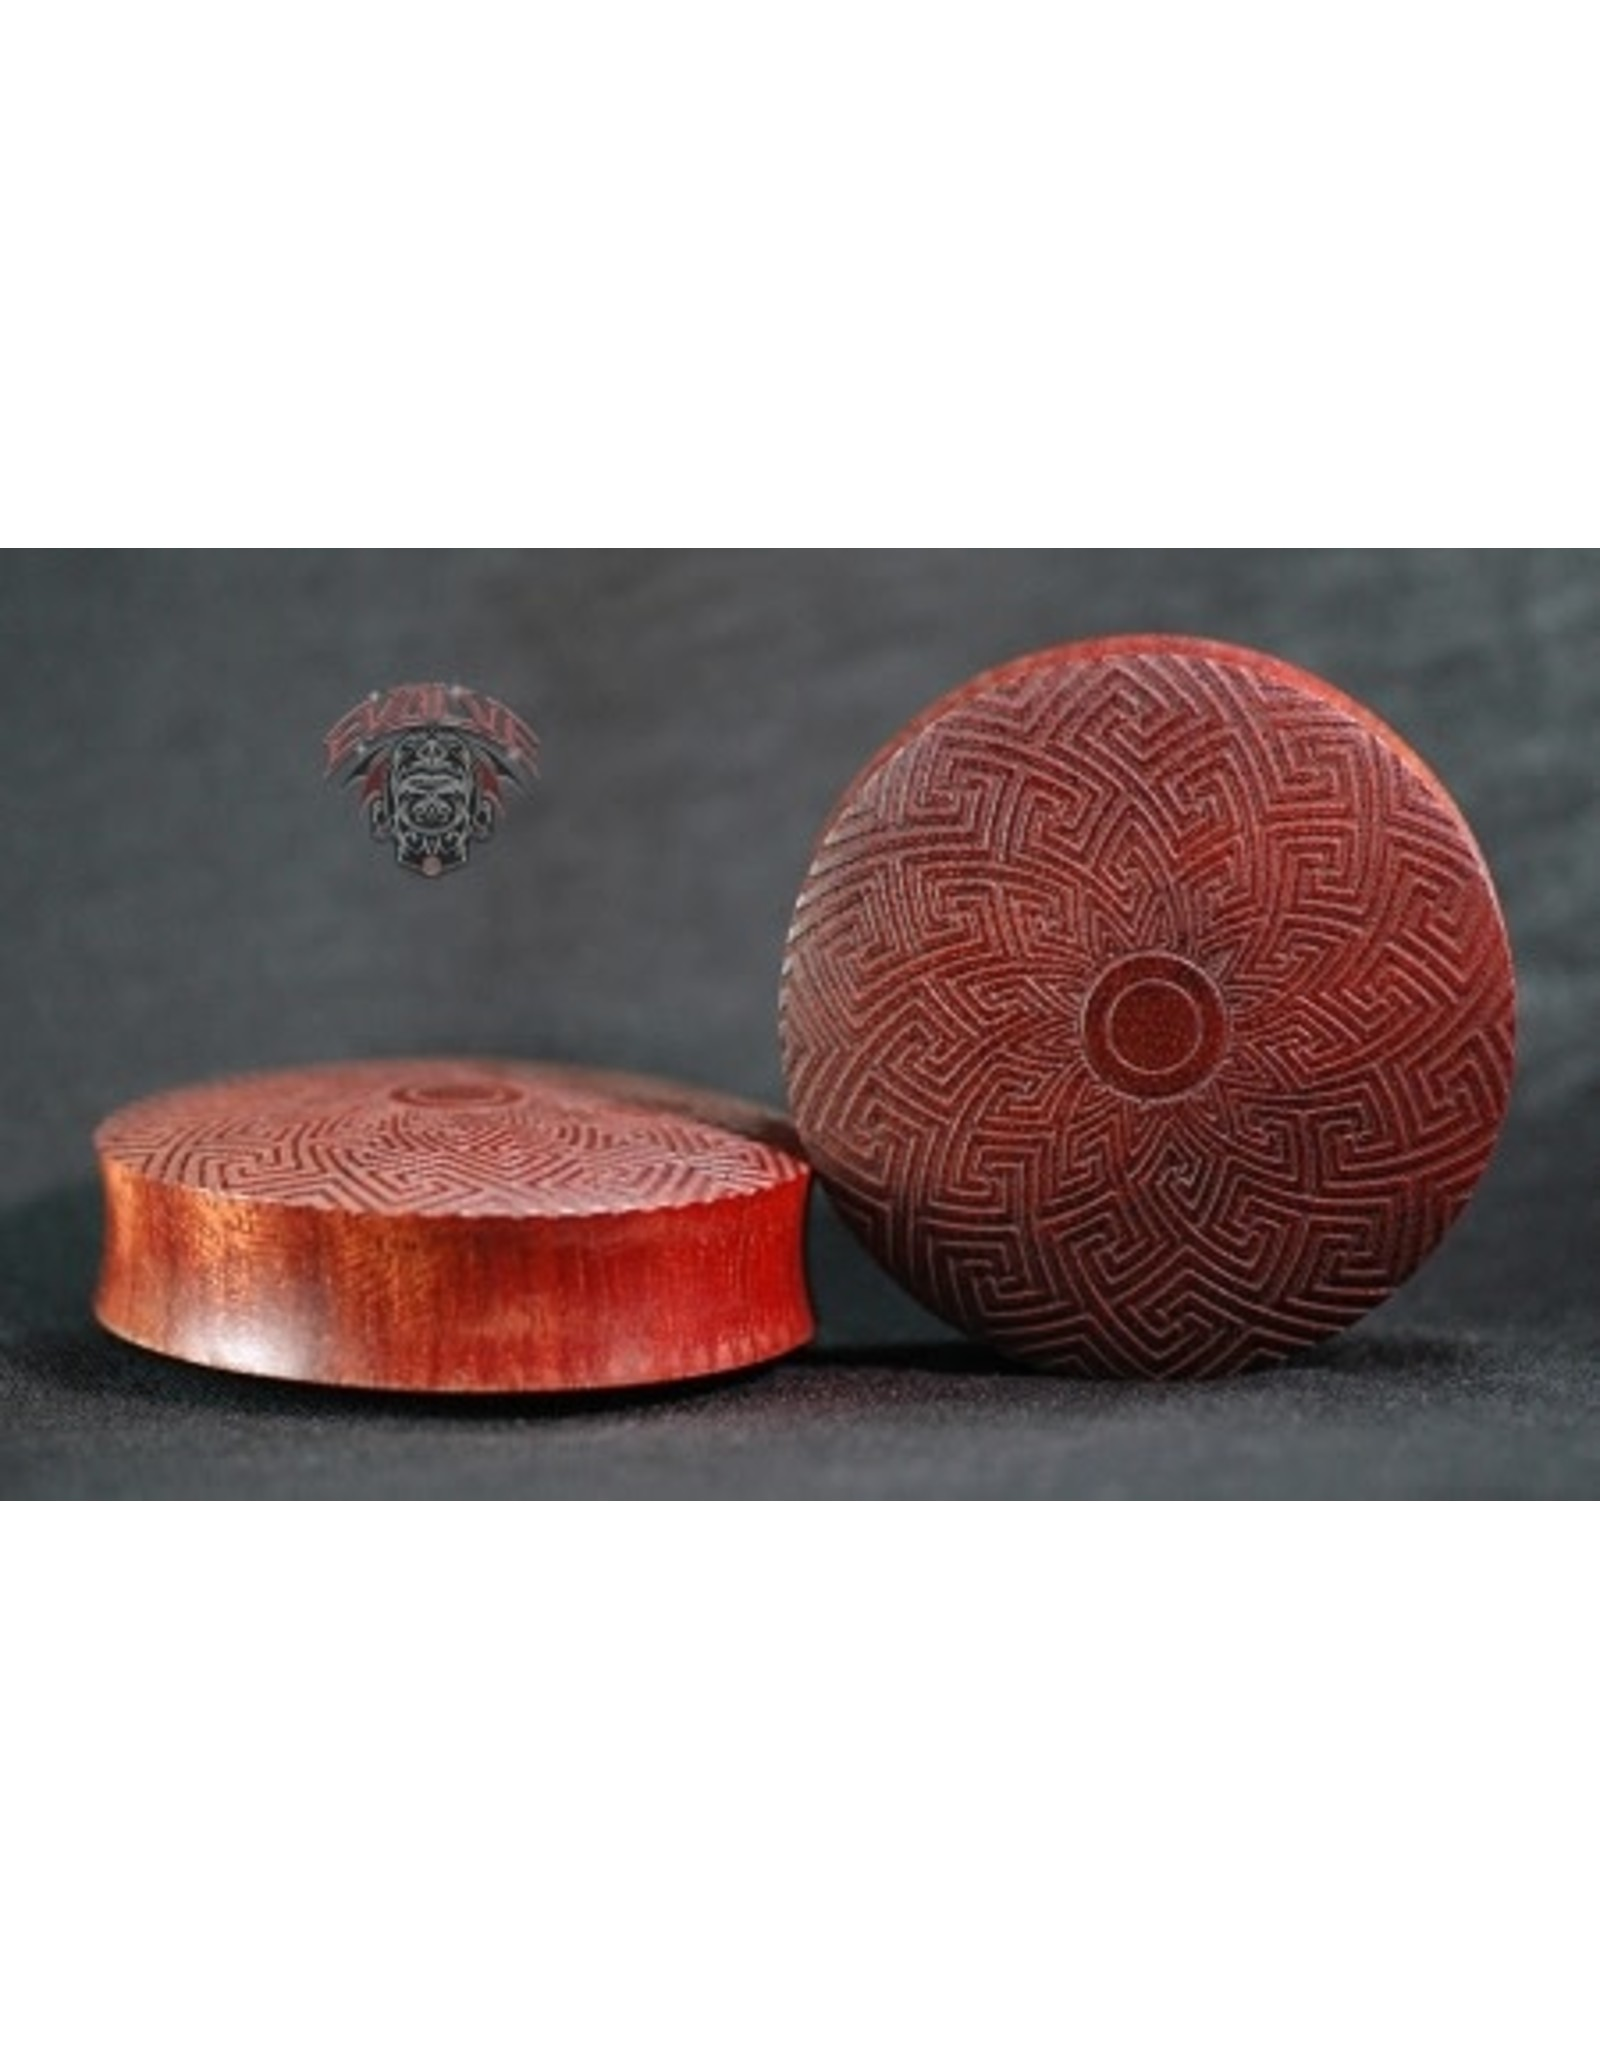 Evolve Laser Etched Wood Plugs